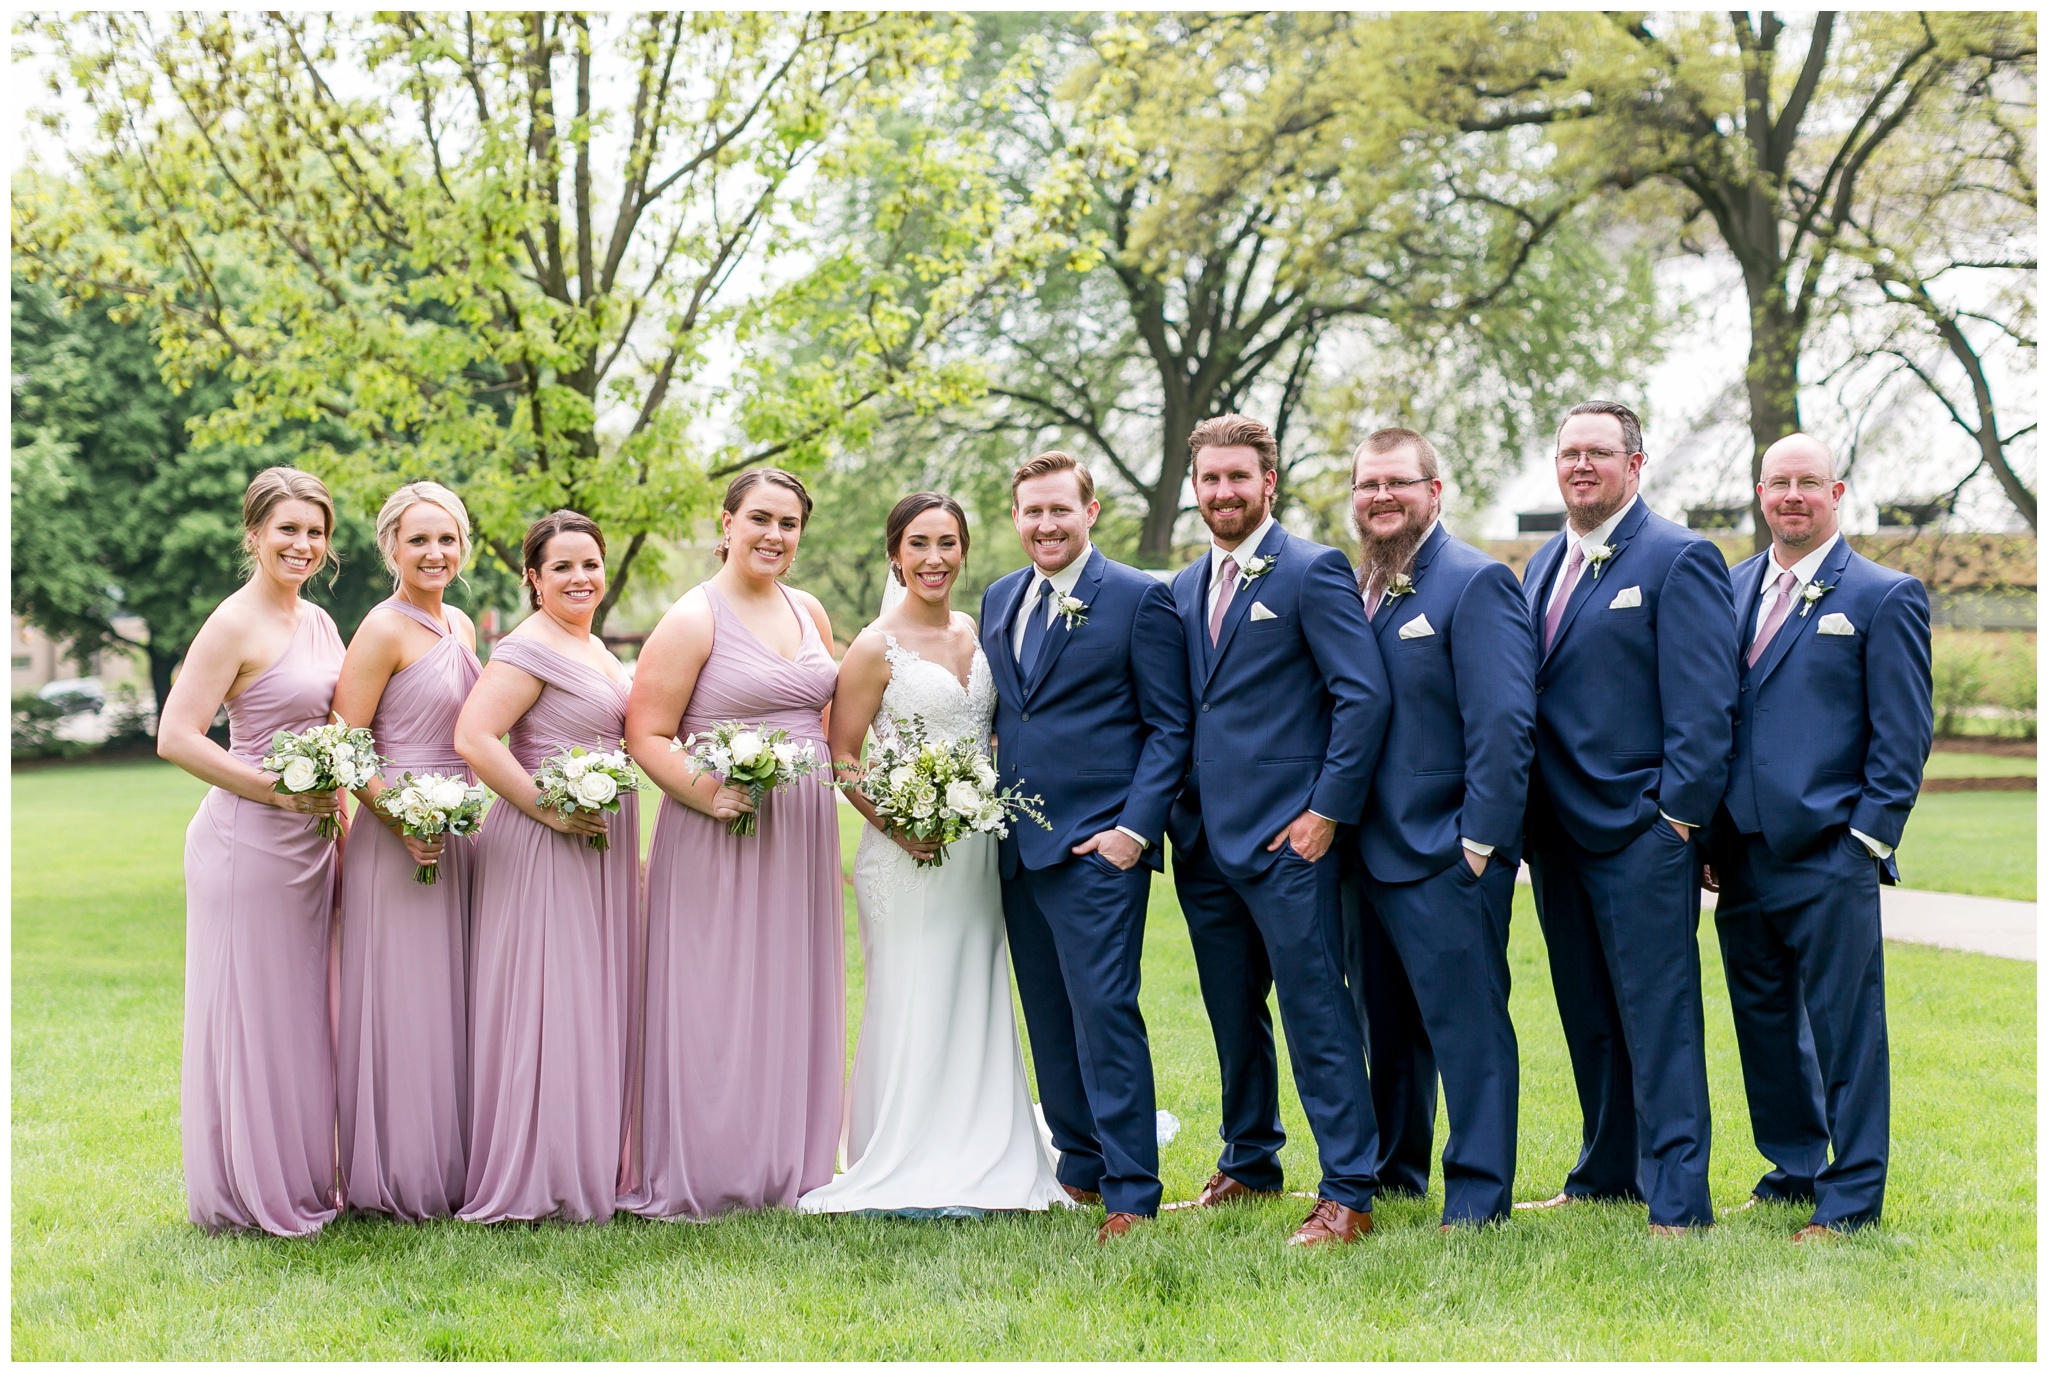 Union_south_Wedding_Madison_Wisconsin_Caynay_Photo_3661.jpg